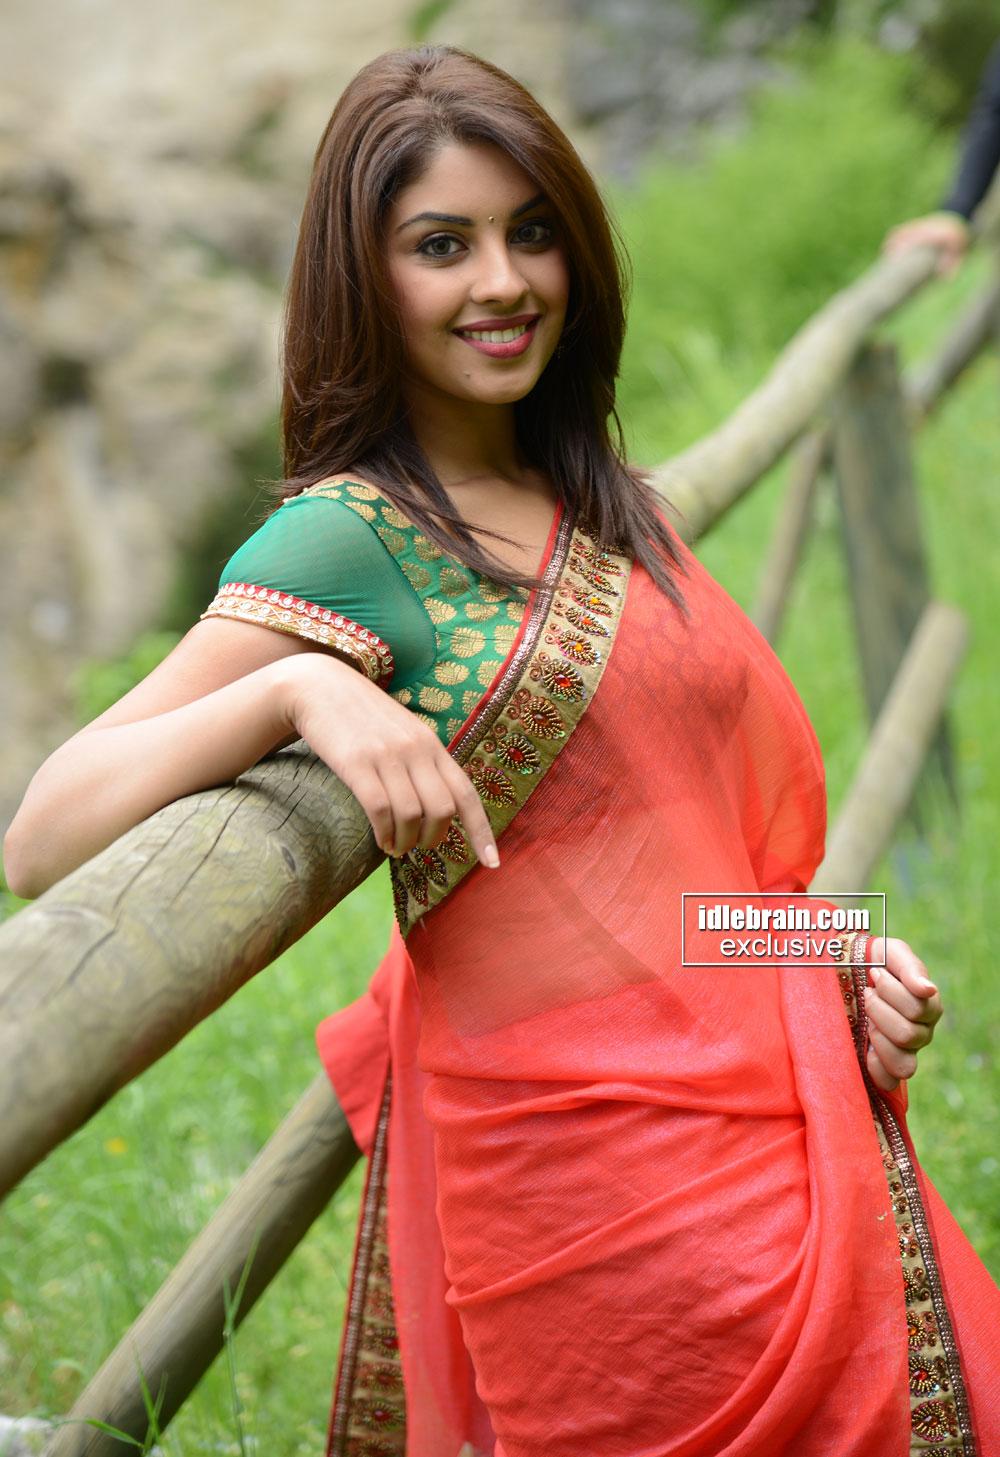 Spicy Saree: Actress Celebrities Photos: Richa Gangopadhyay HD Hot In